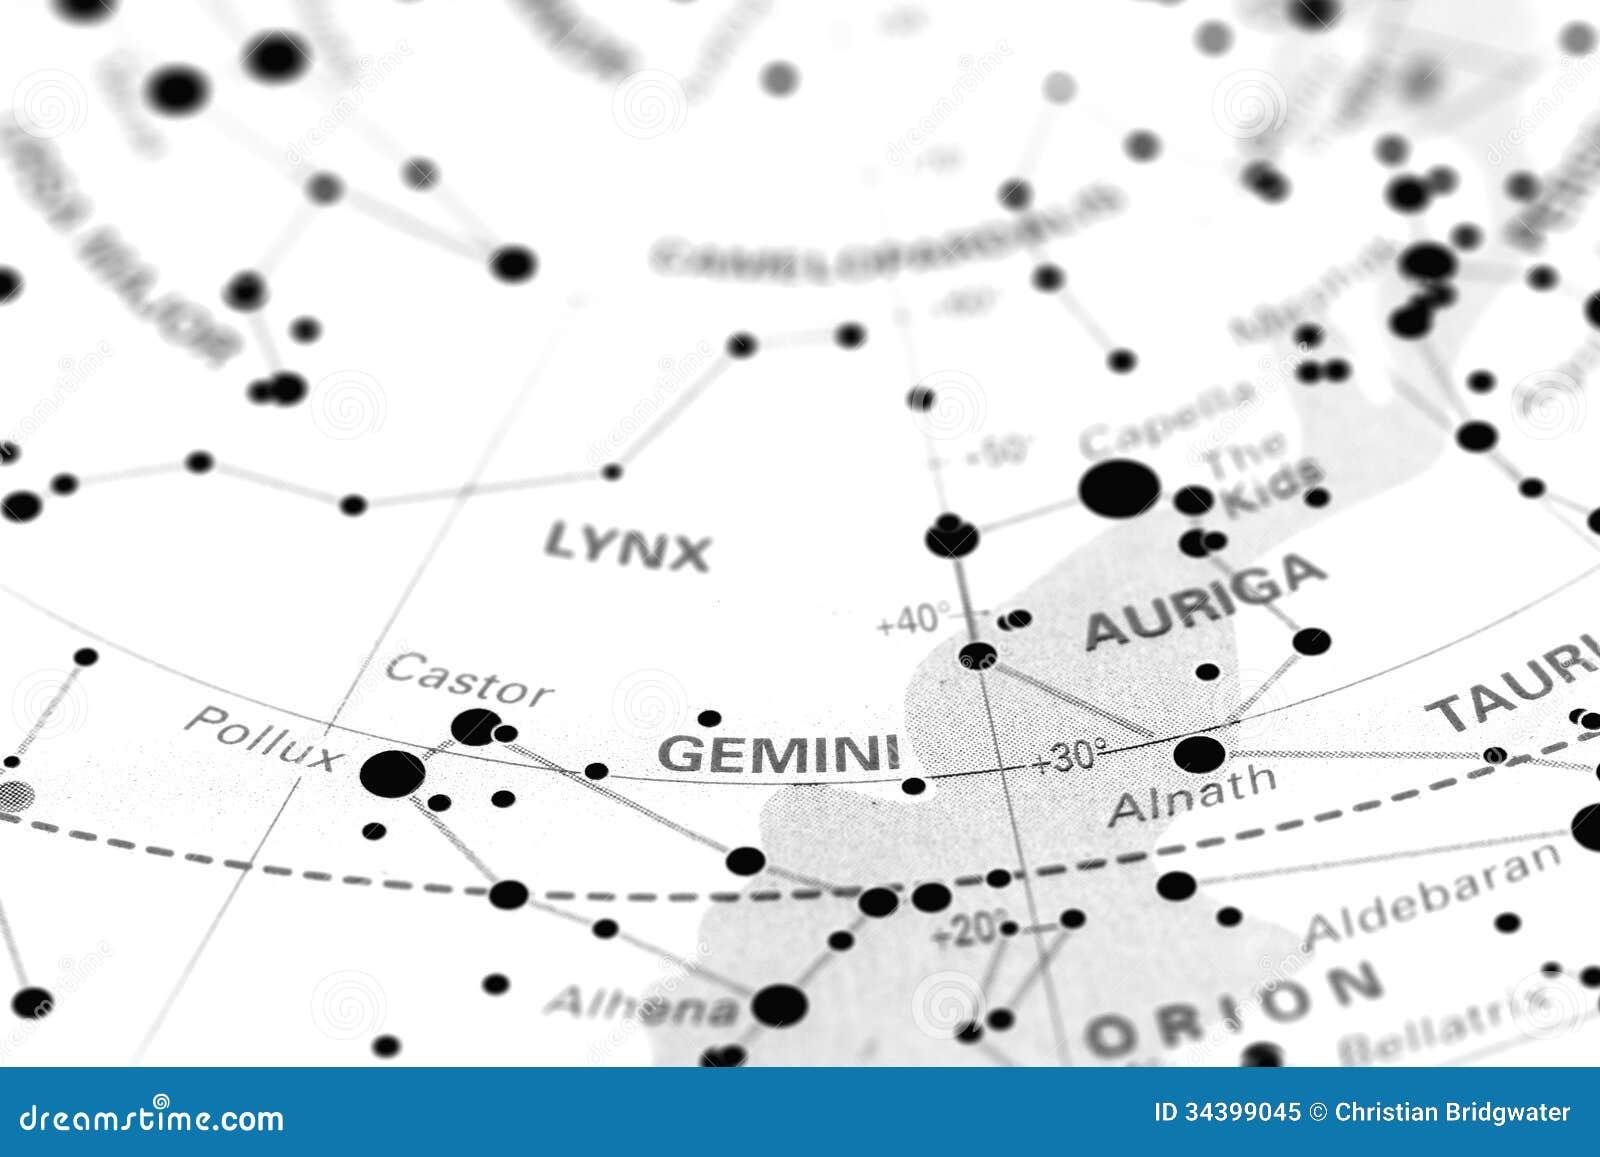 Gemini on star map stock image  Image of astronomy, dash - 34399045